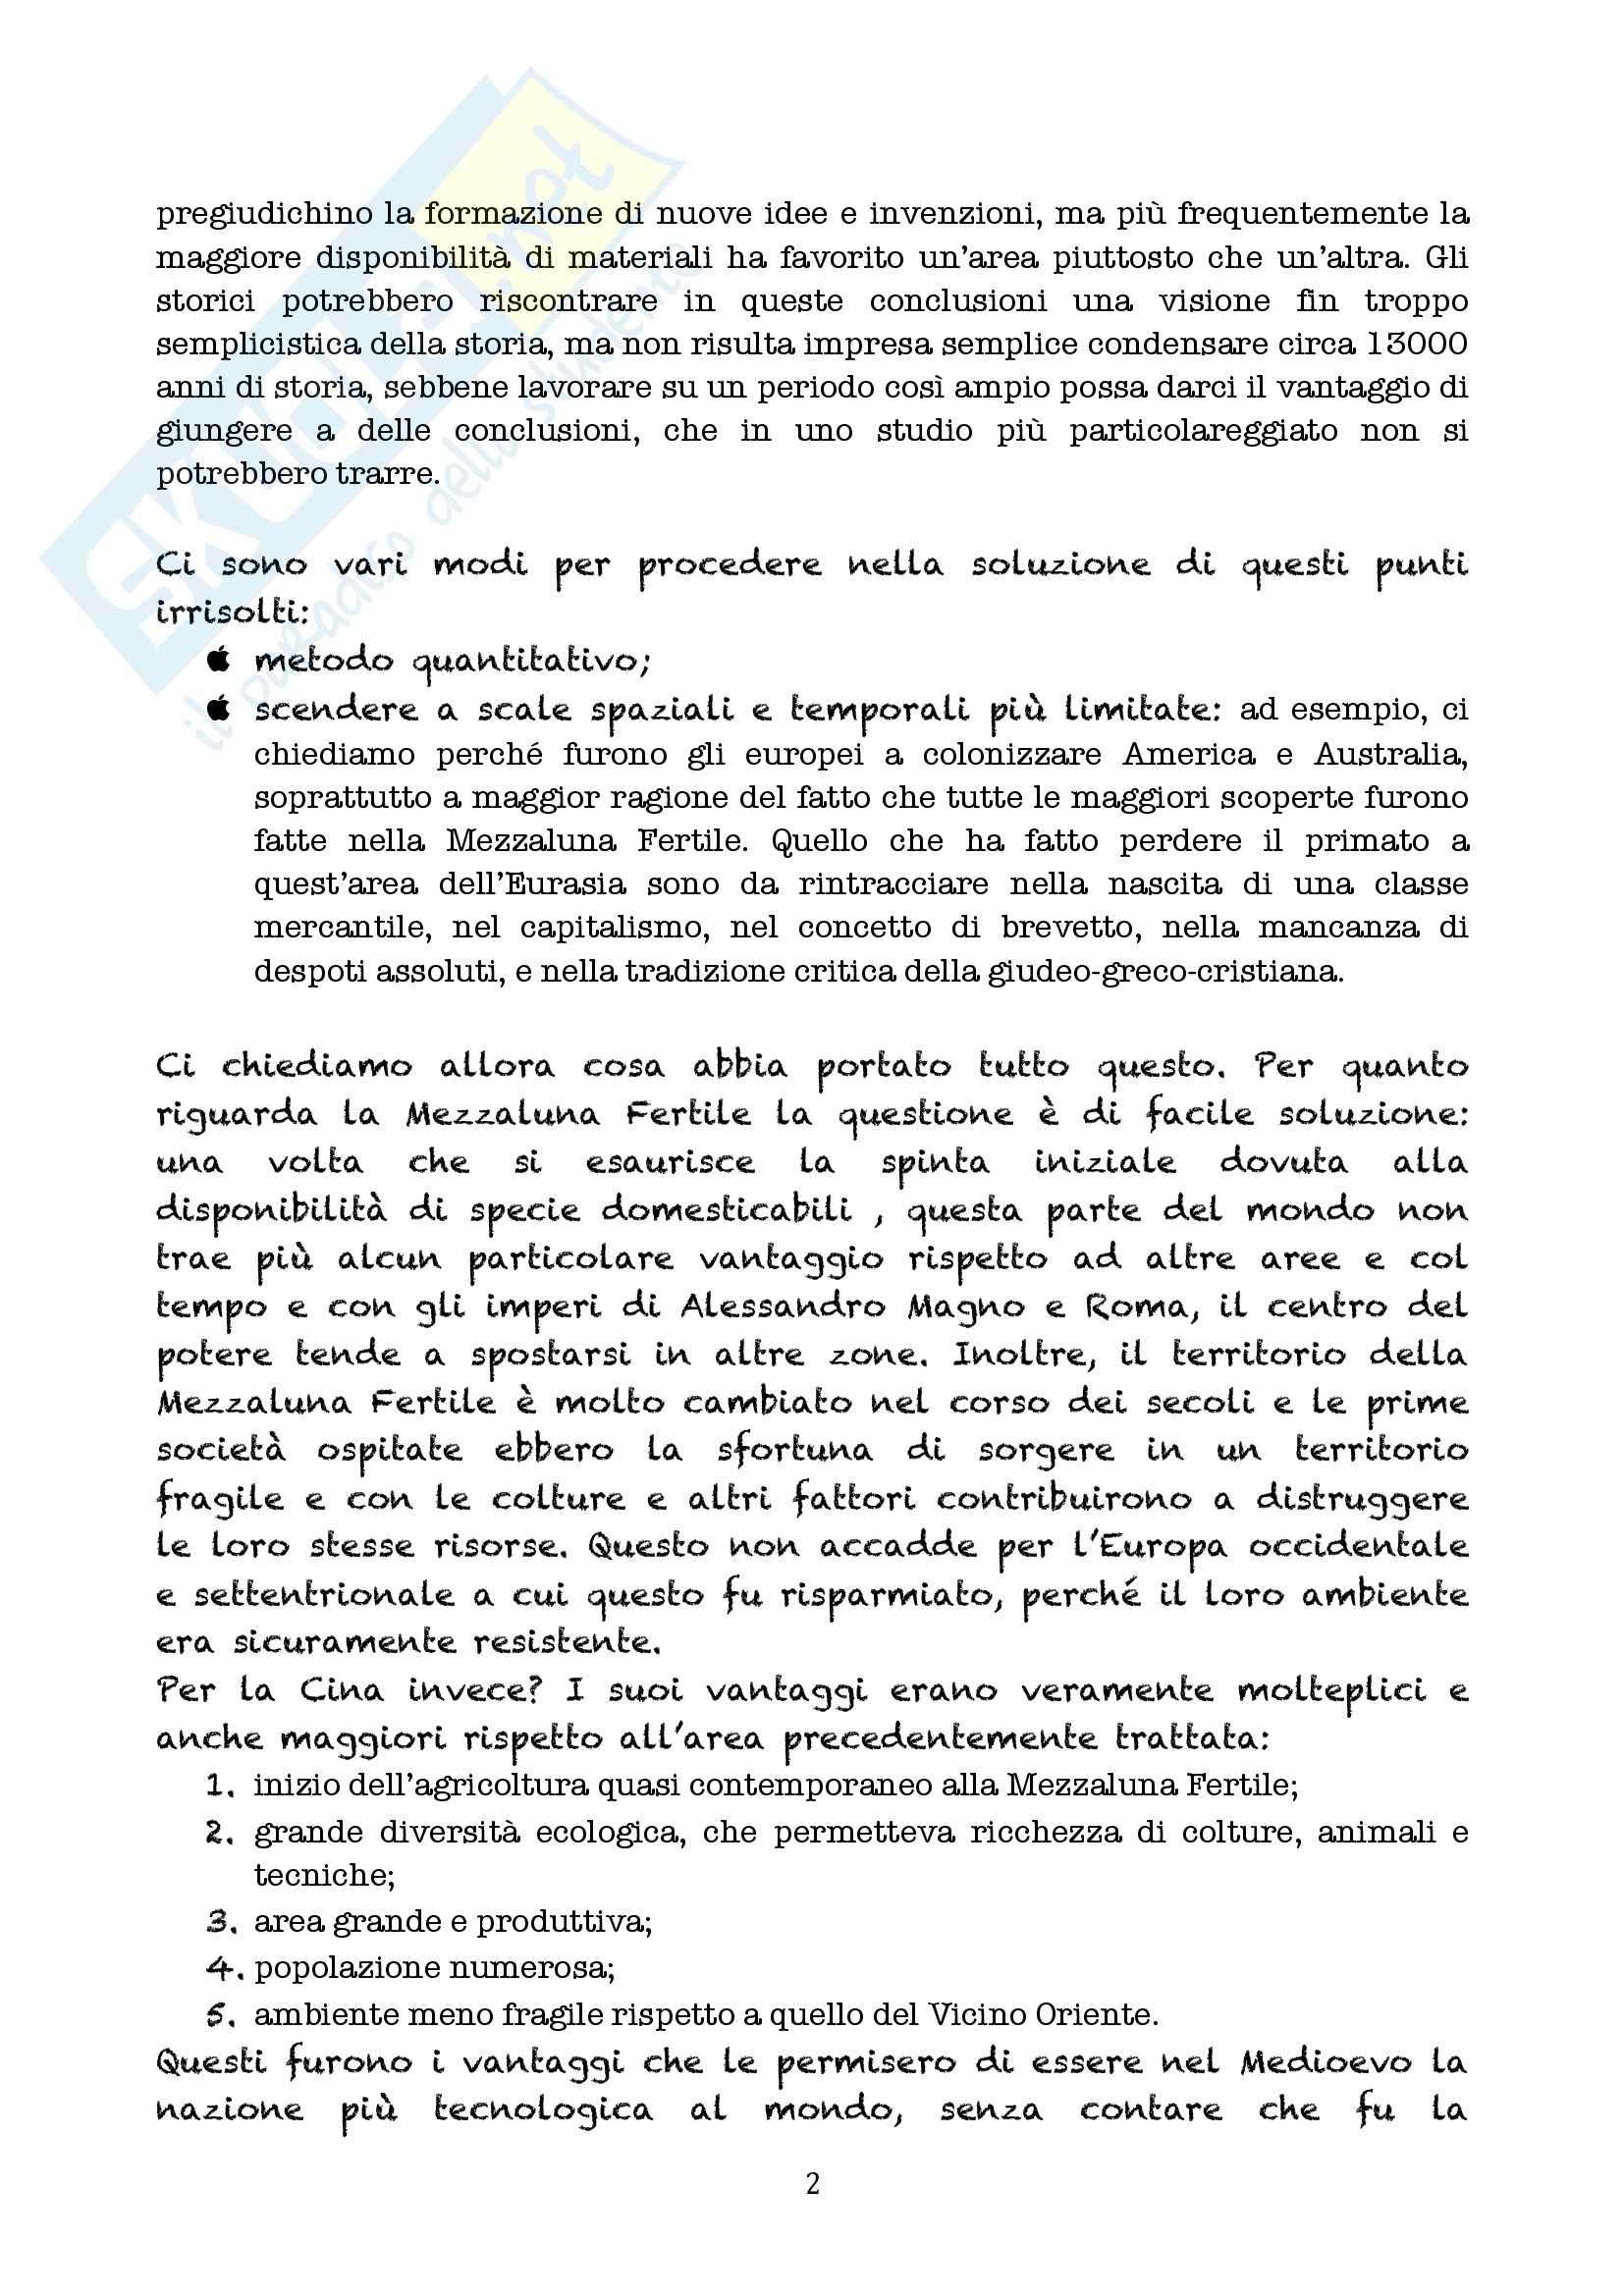 Riassunto esame Linguistica generale, prof. Longobardi, libro consigliato Armi, acciaio e malattie, Diamond (Epilogo) Pag. 2